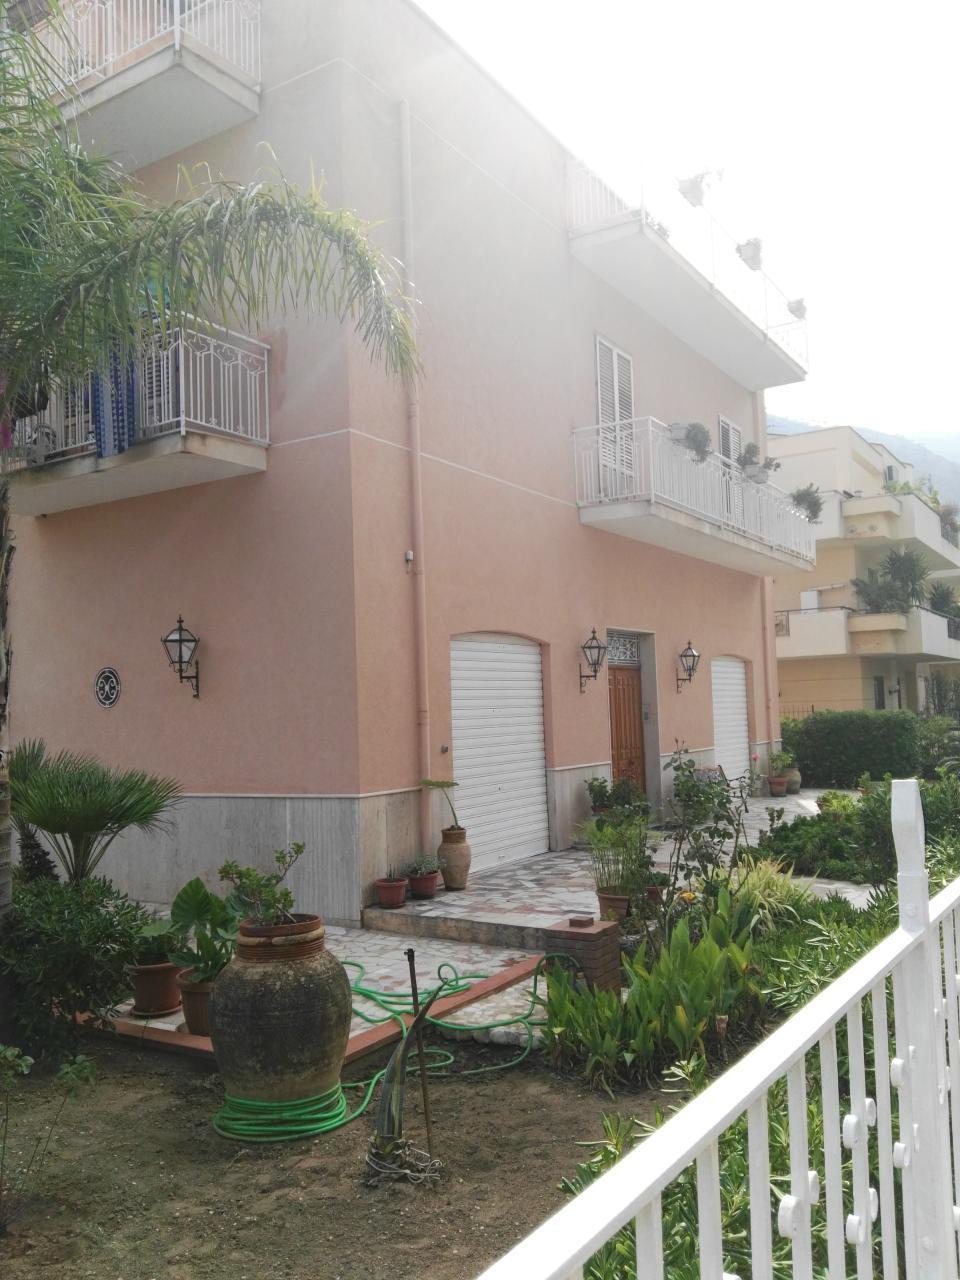 Maison de vacances Castellammare del Golfo Villalba A (34542), Castellammare del Golfo, Trapani, Sicile, Italie, image 13